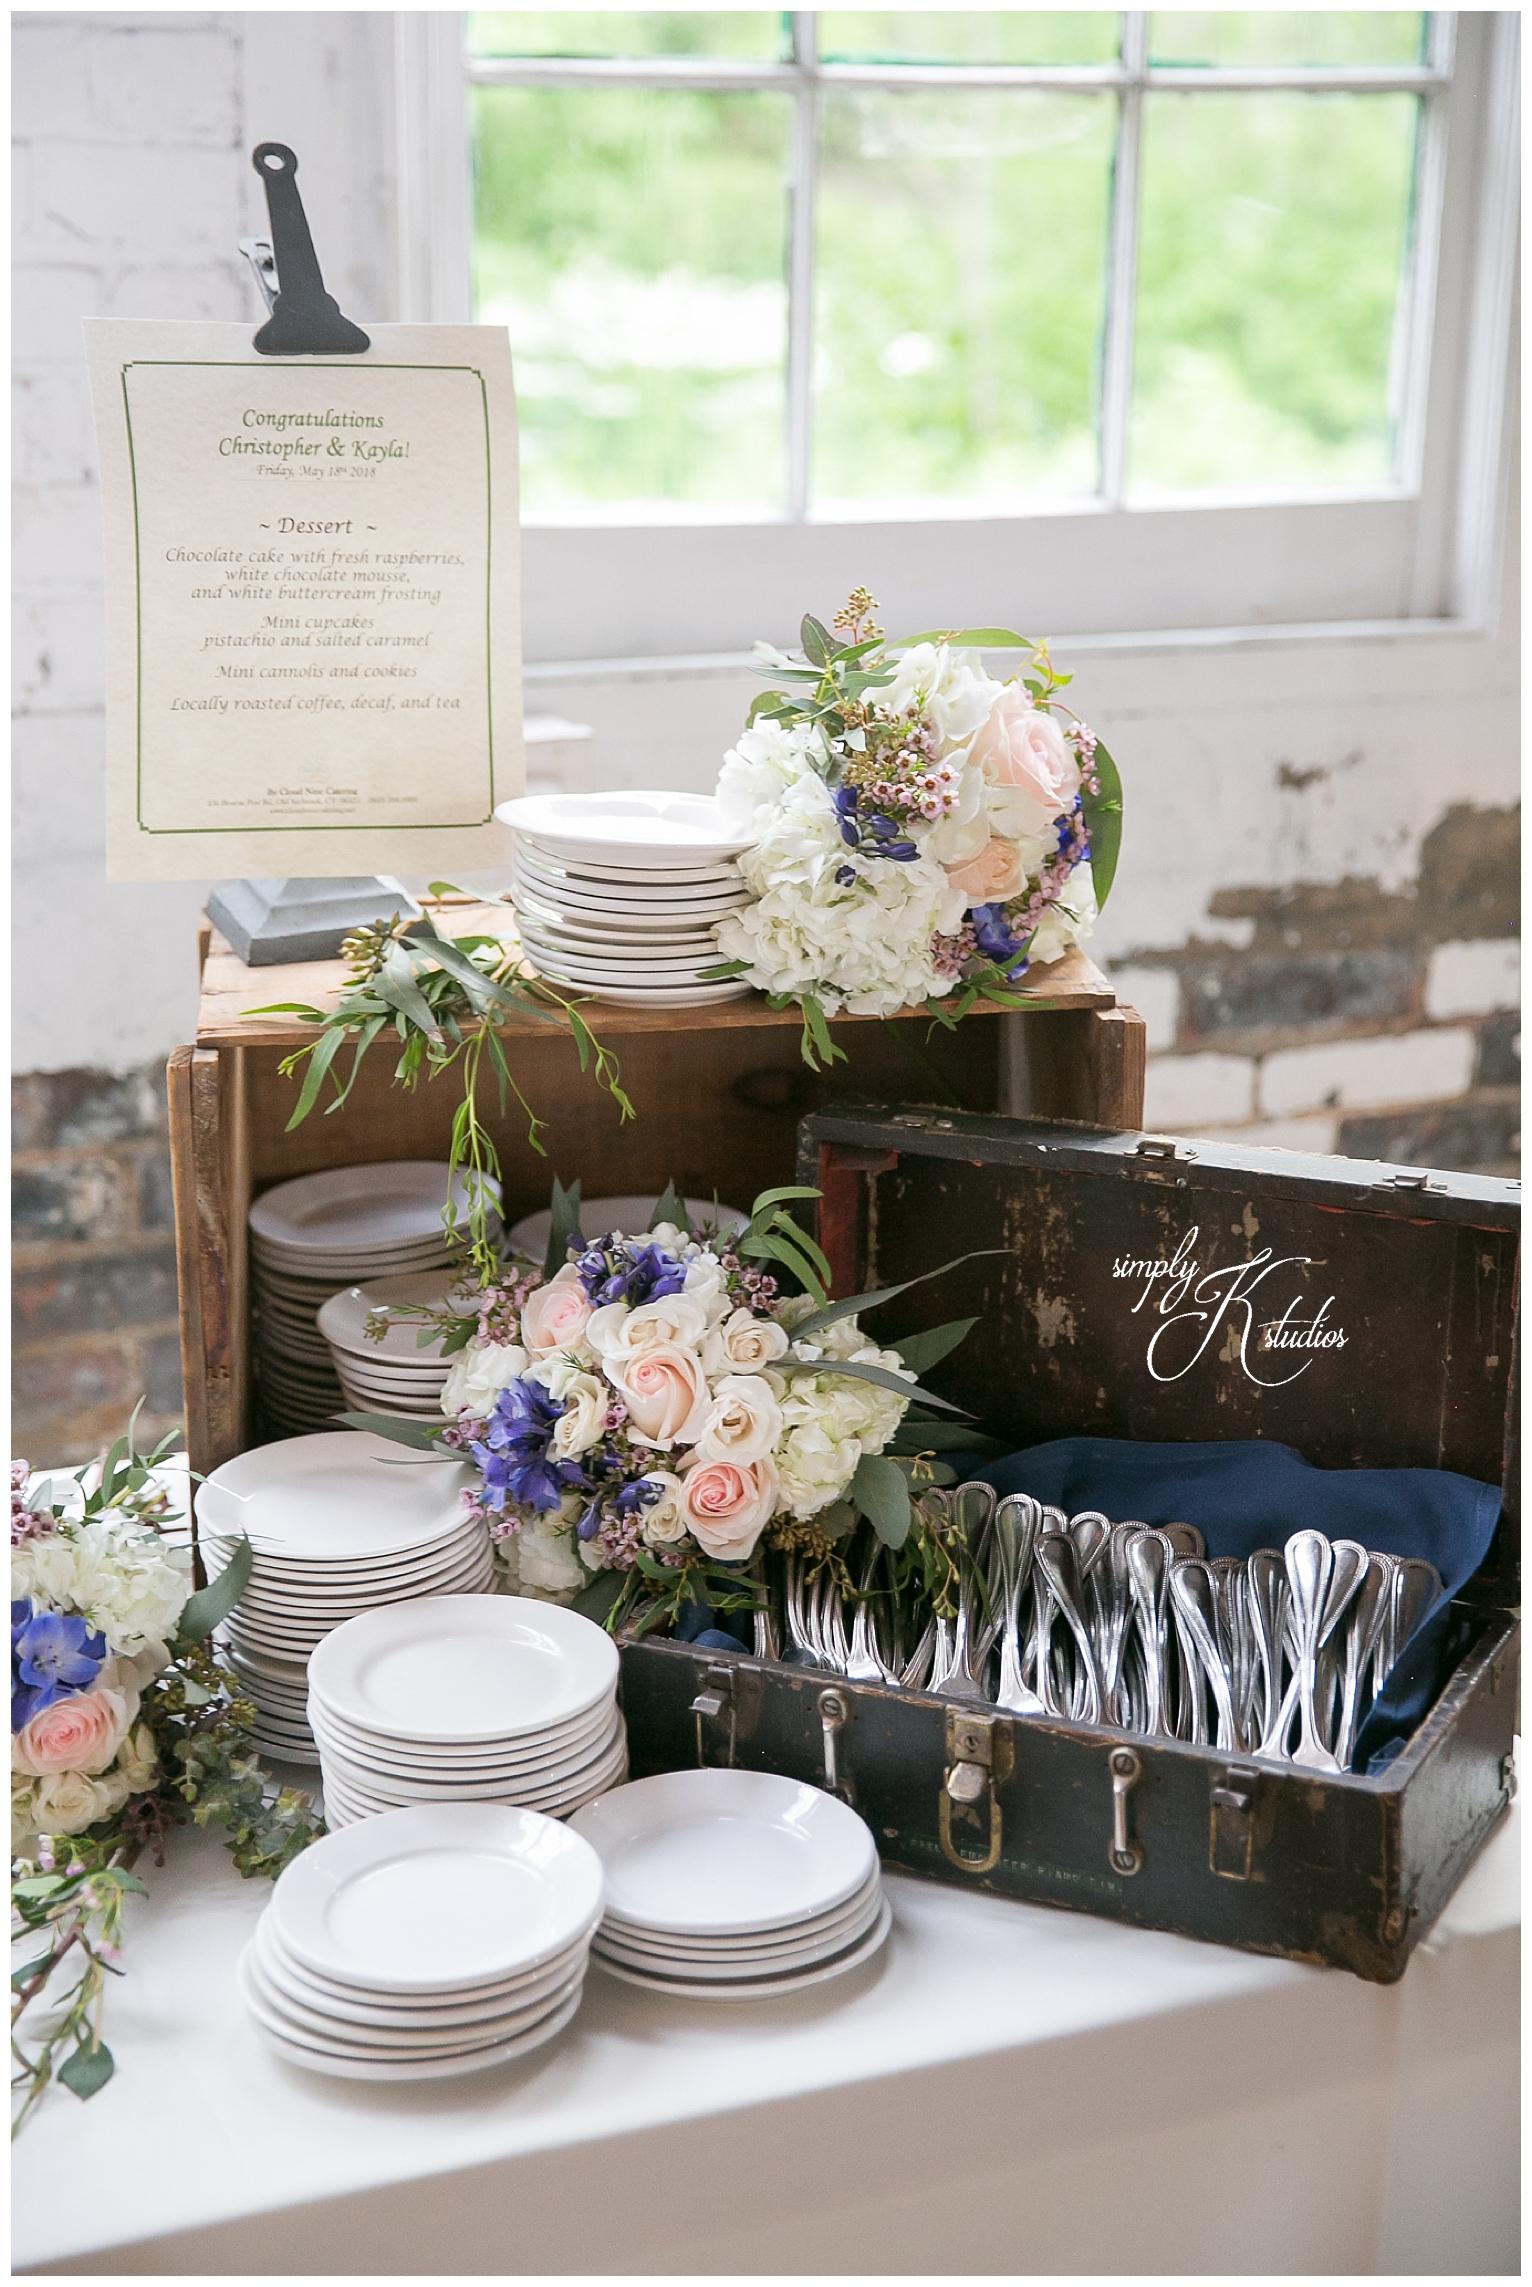 Dessert Stations at a Wedding.jpg